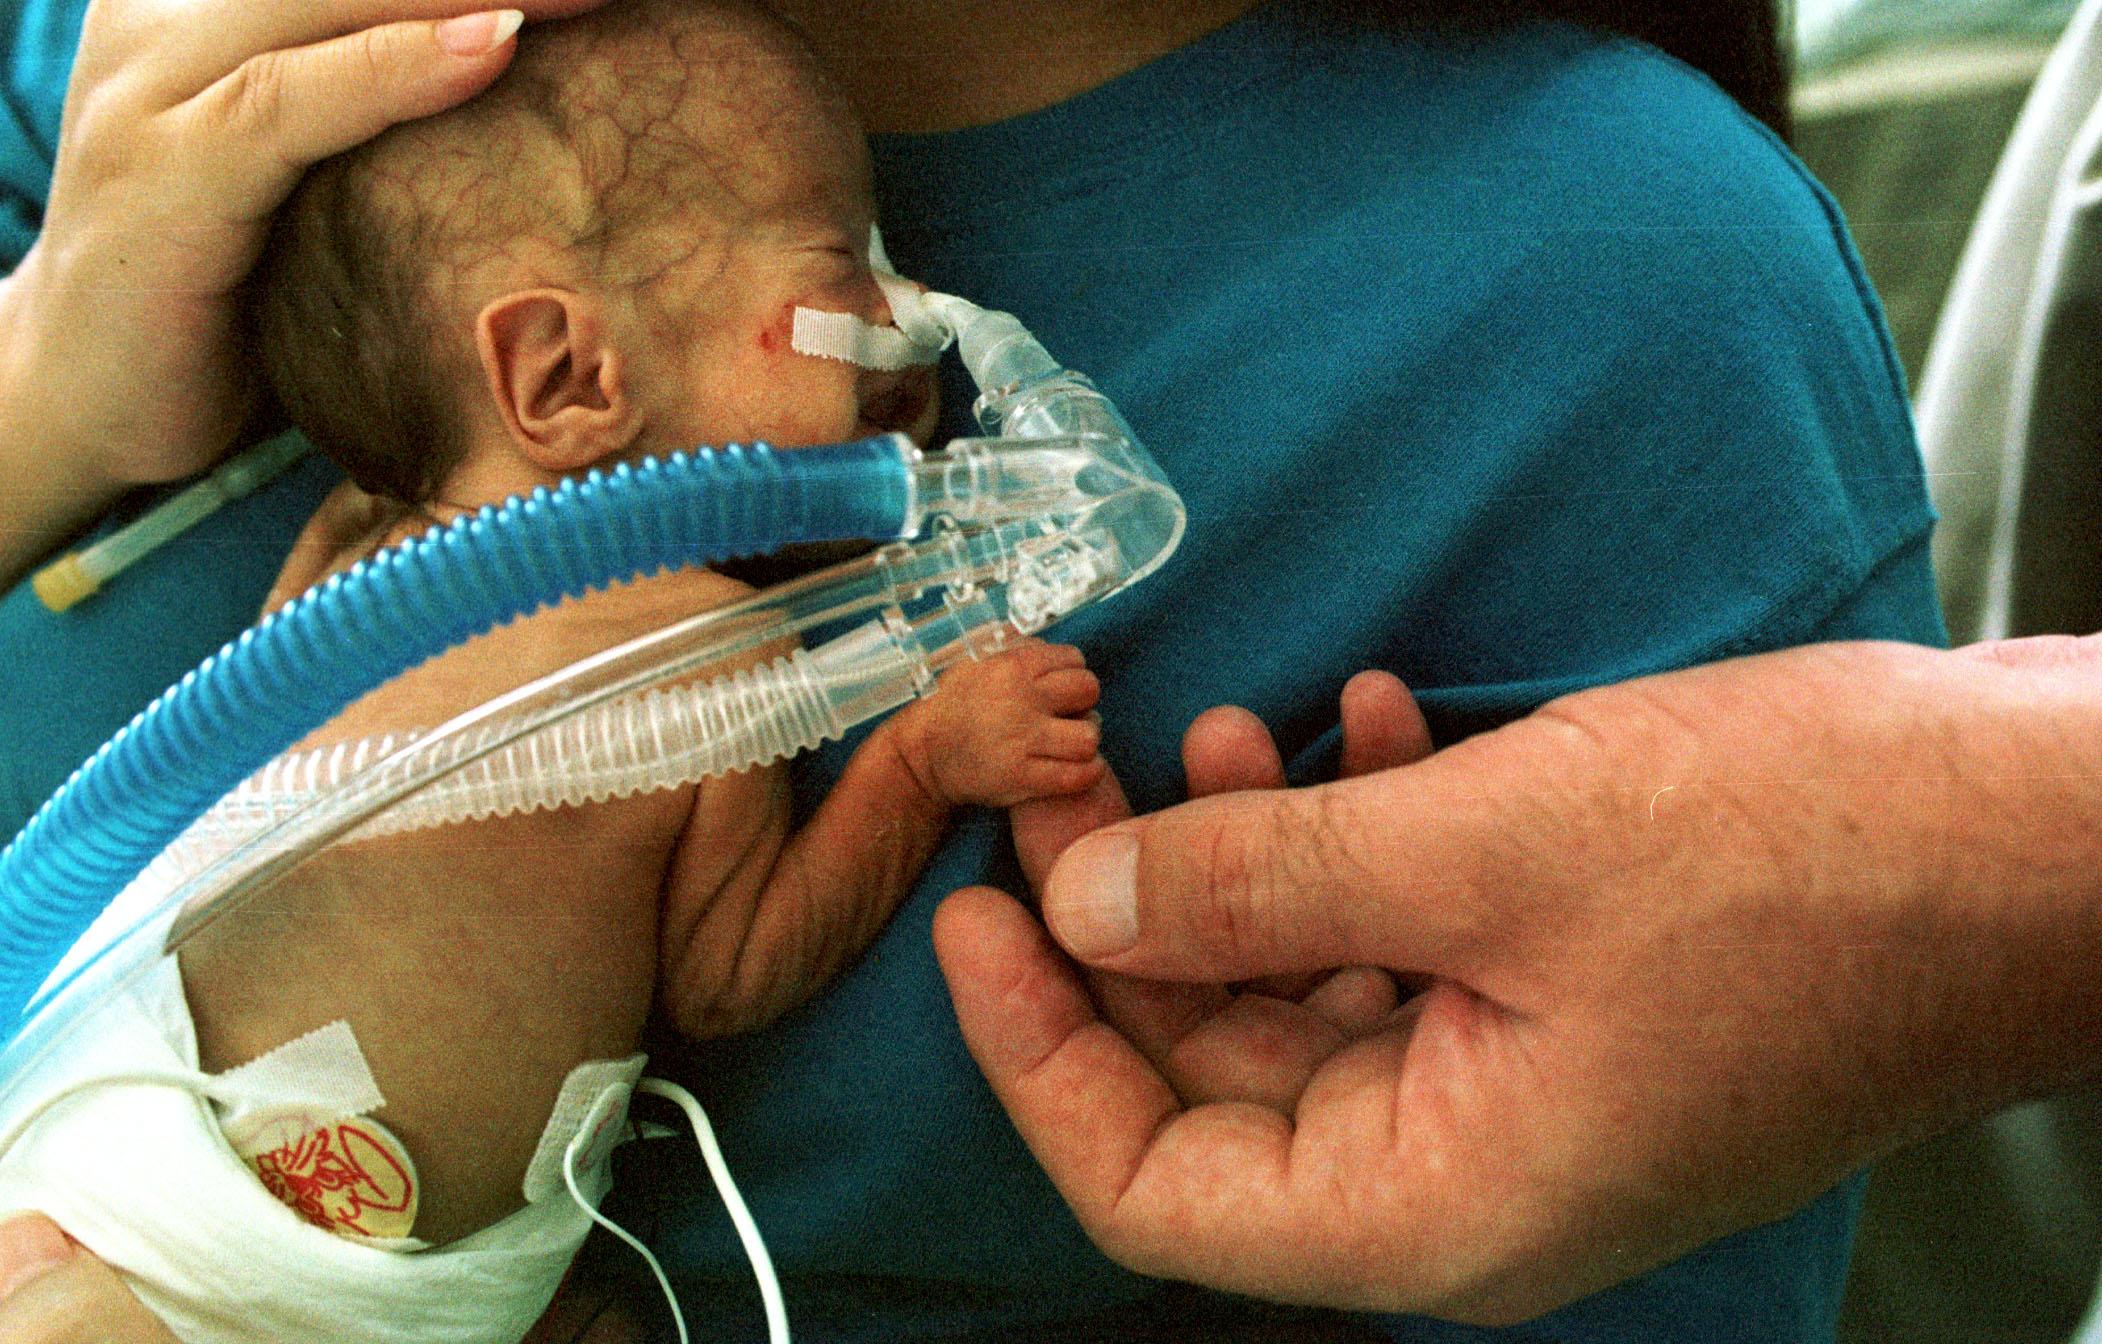 Neonatal Nurses Do Way More Than Hold Babies